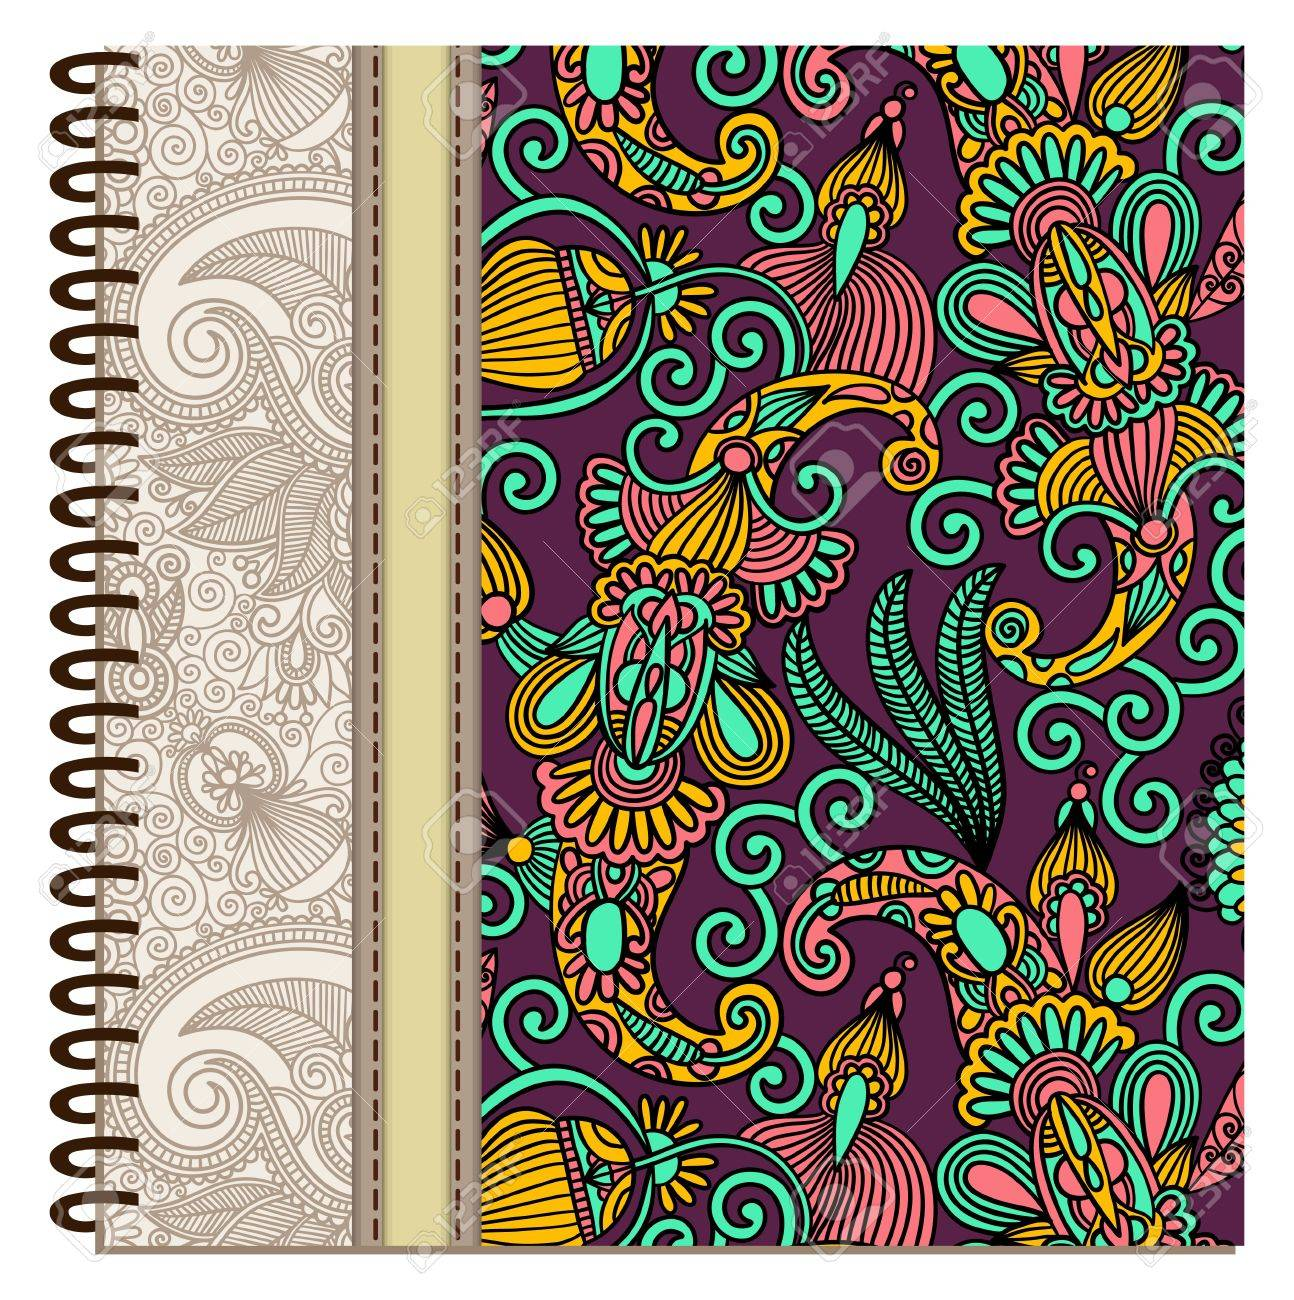 design of spiral ornamental notebook cover Stock Vector - 15552382